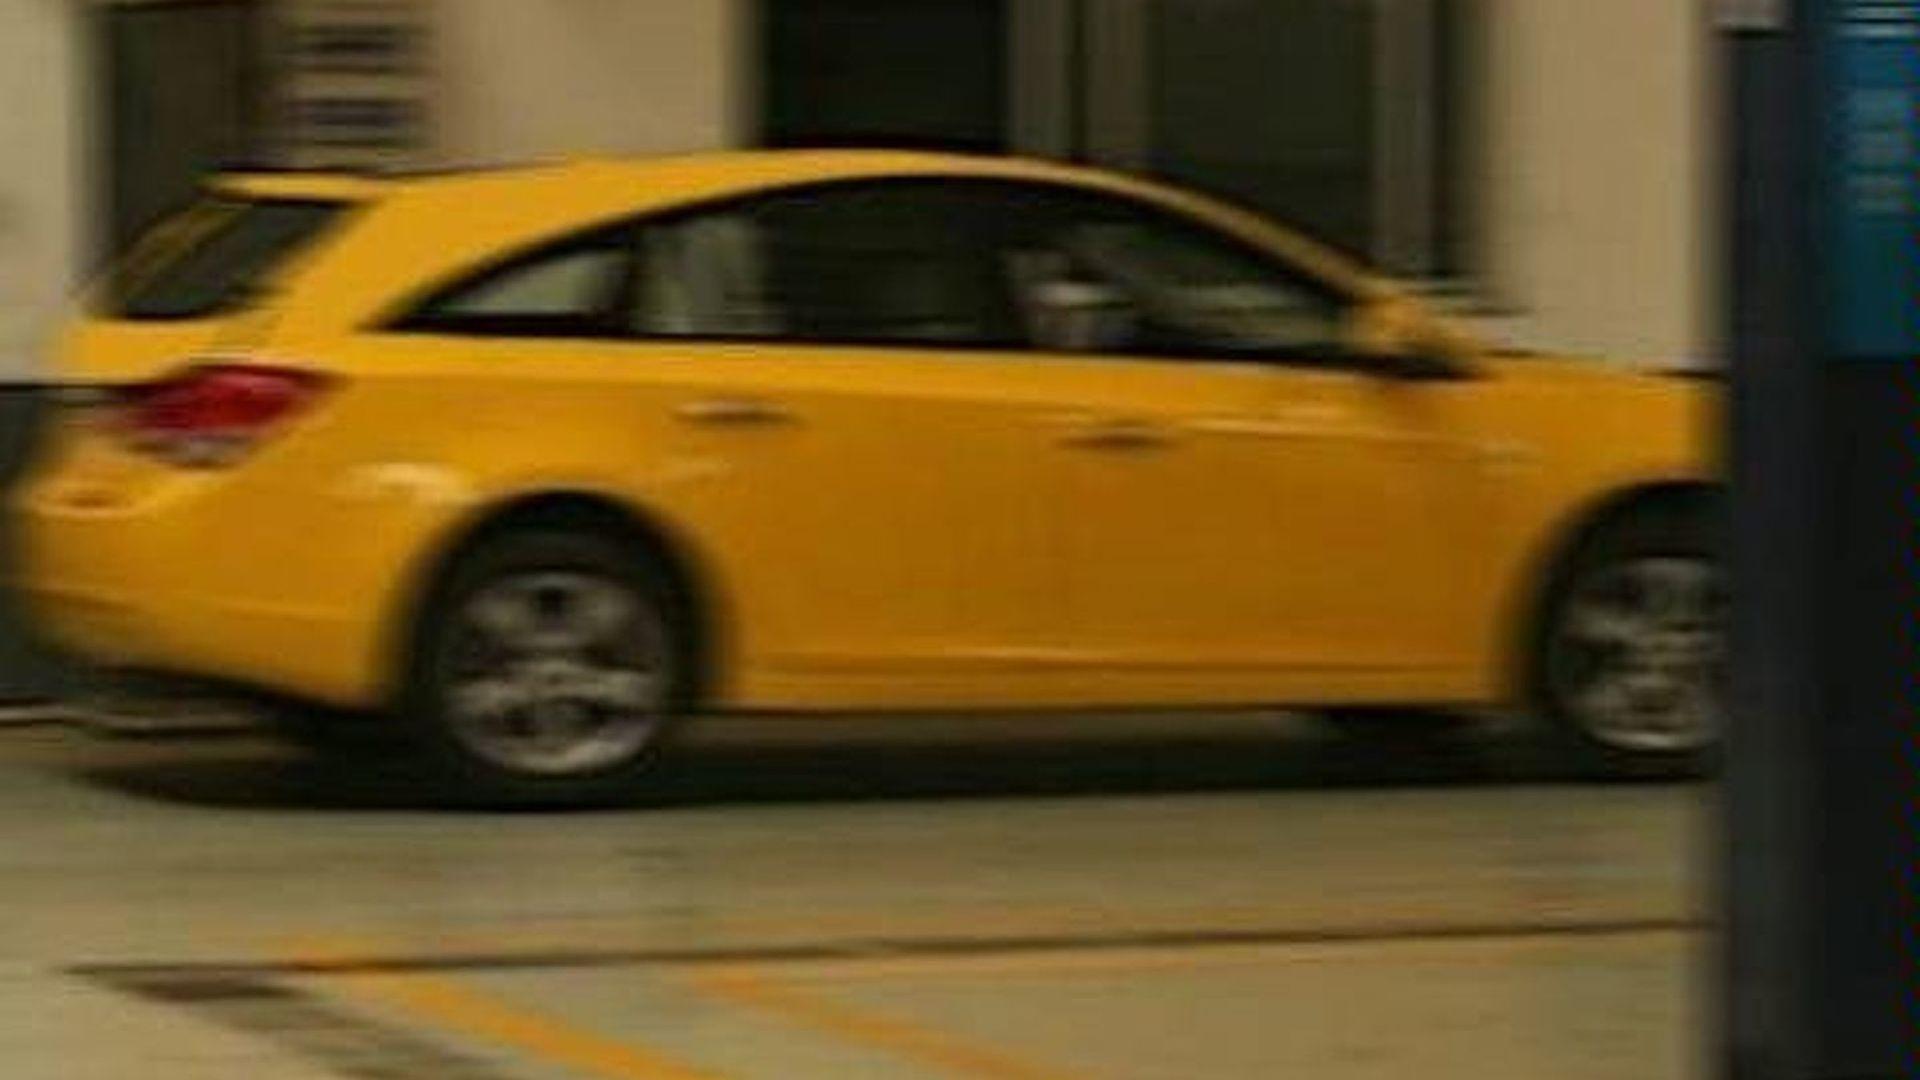 Chevy Cruze Wagon Spied [UPDATE]